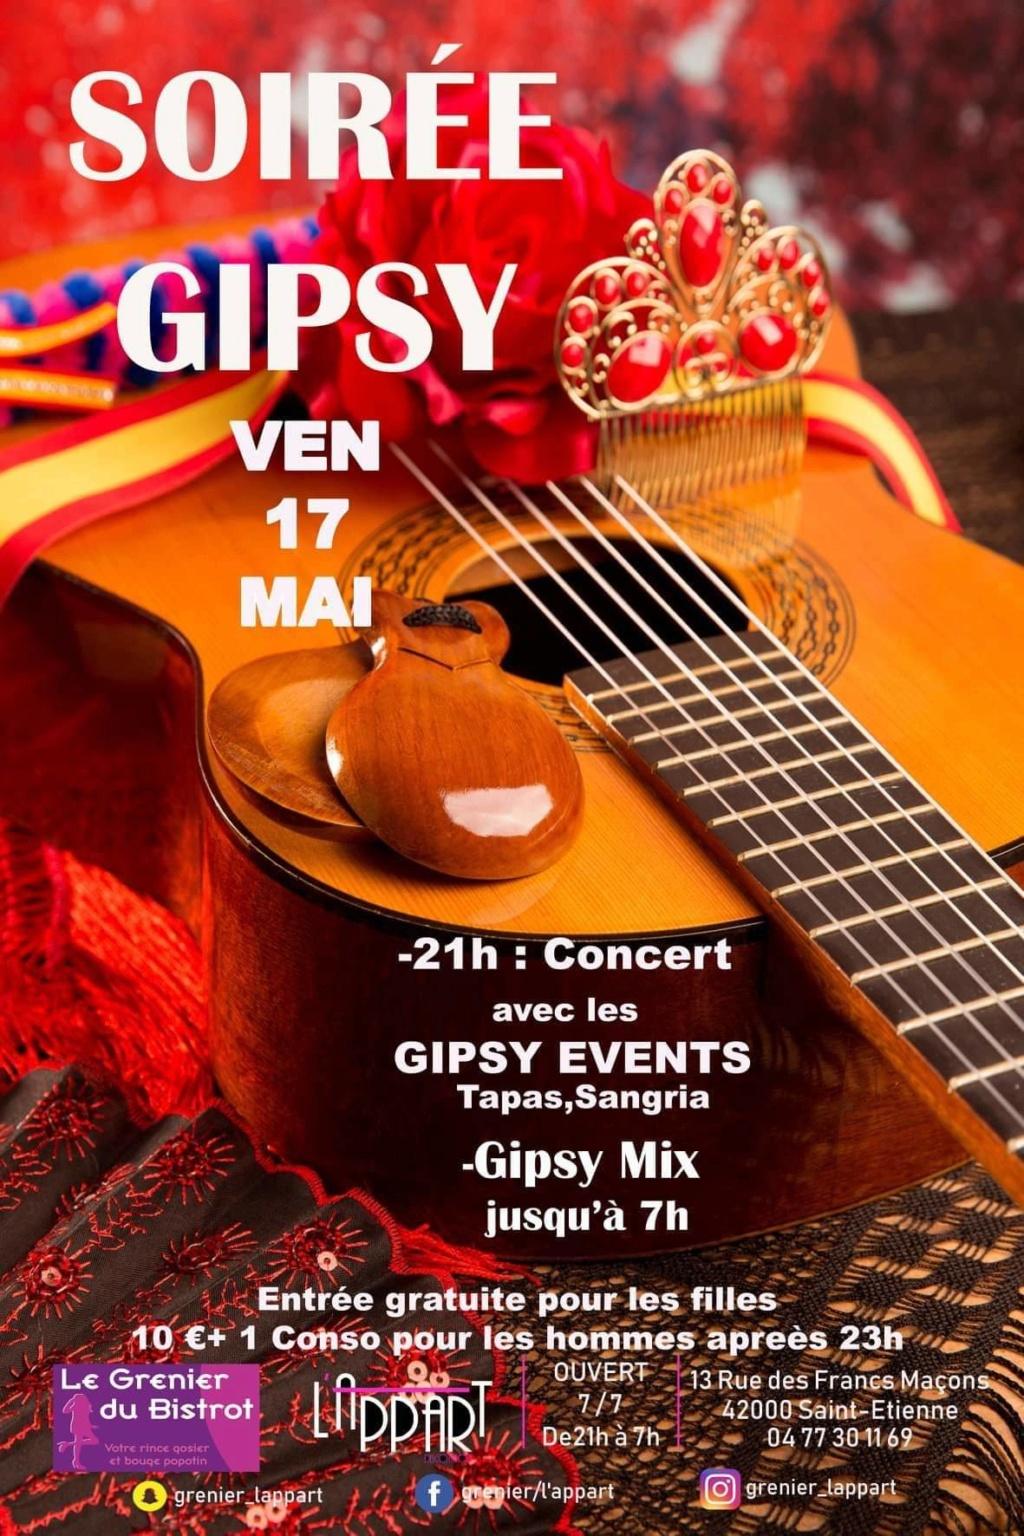 Soirée Gipsy à Saint Étienne  le 17 Mai  Fb_im152